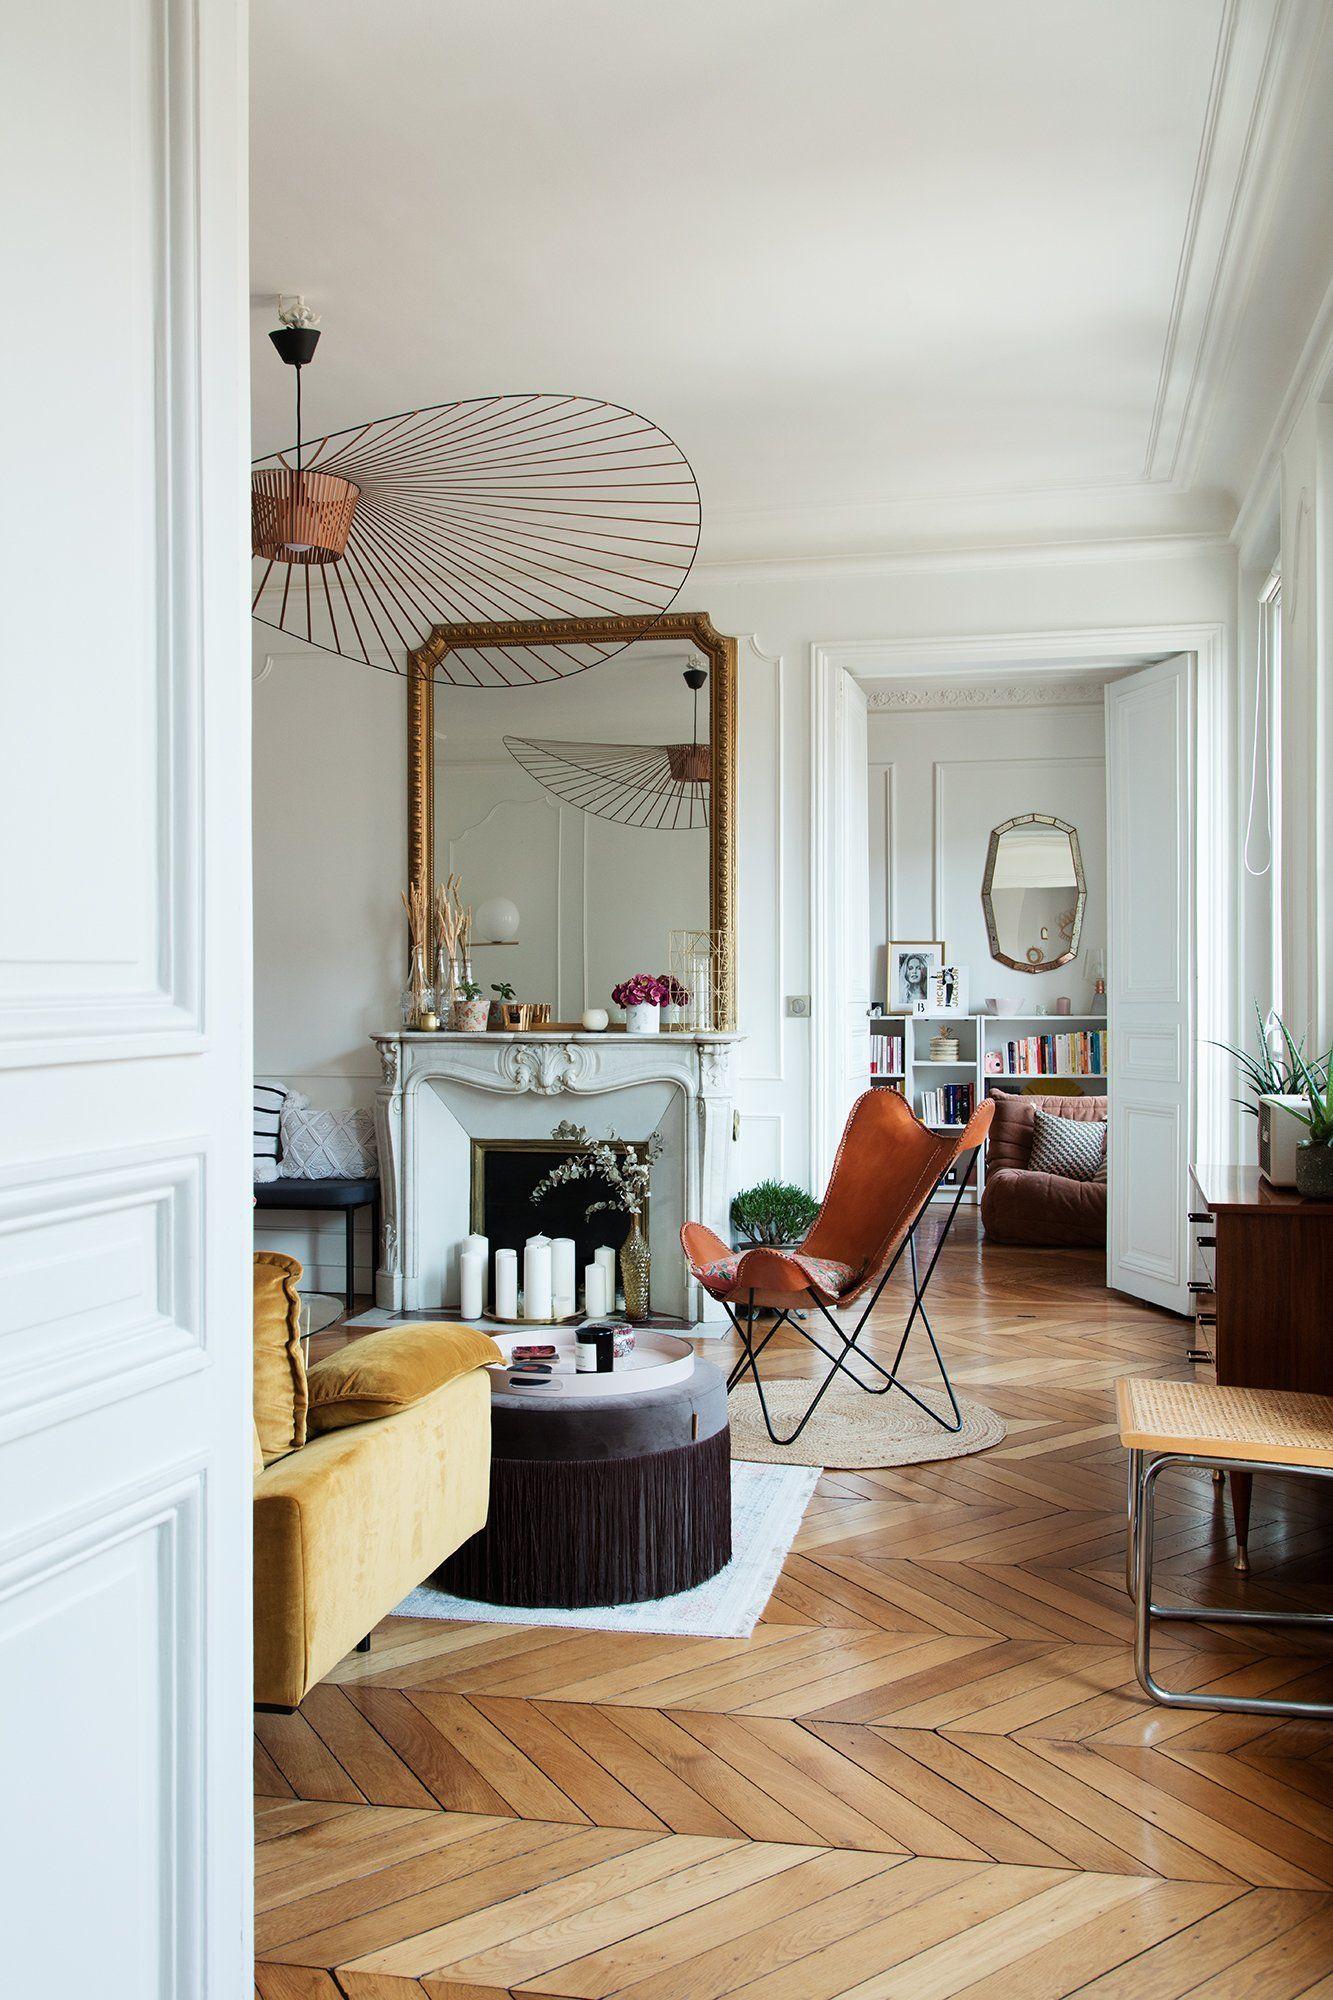 4 Exquisite Chandeliers From 2 Amazing Light Brands Decoration Interieur Appartement Décoration Salon Appartement Deco Appartement